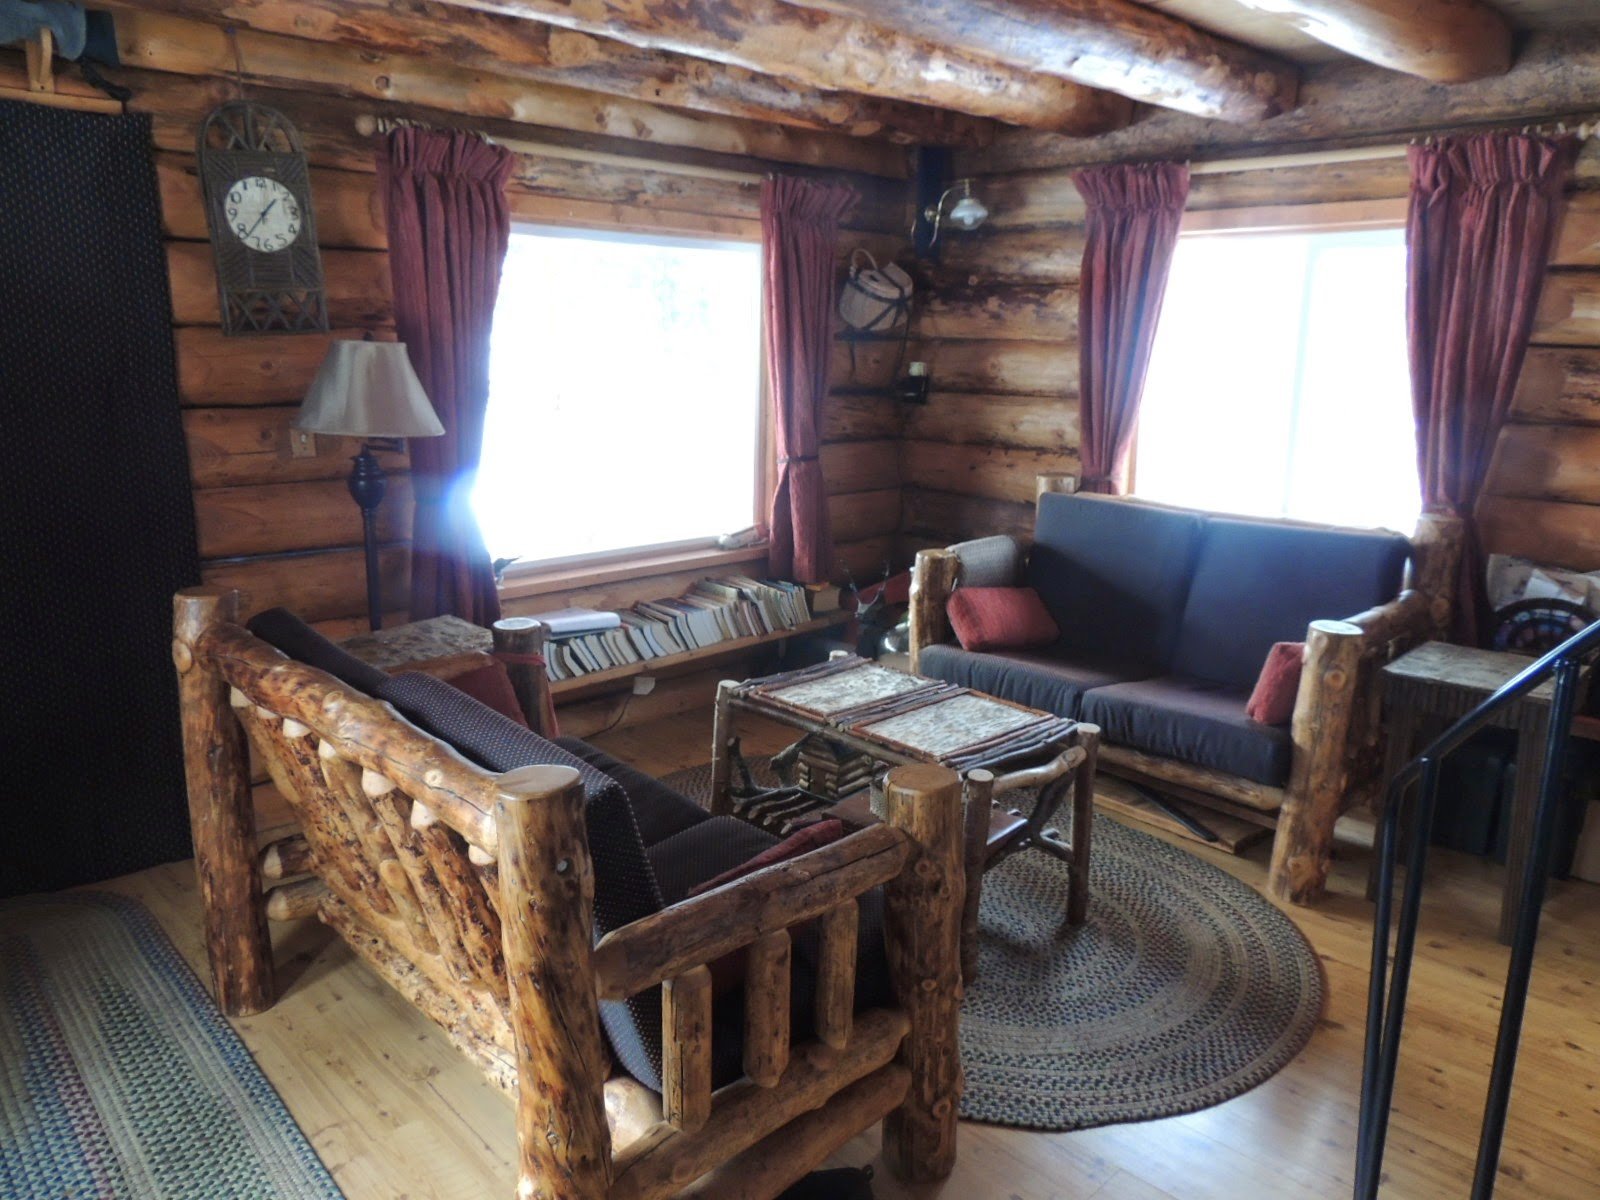 Alaska bush life off road off grid tiny house furnishings for Small cabin living